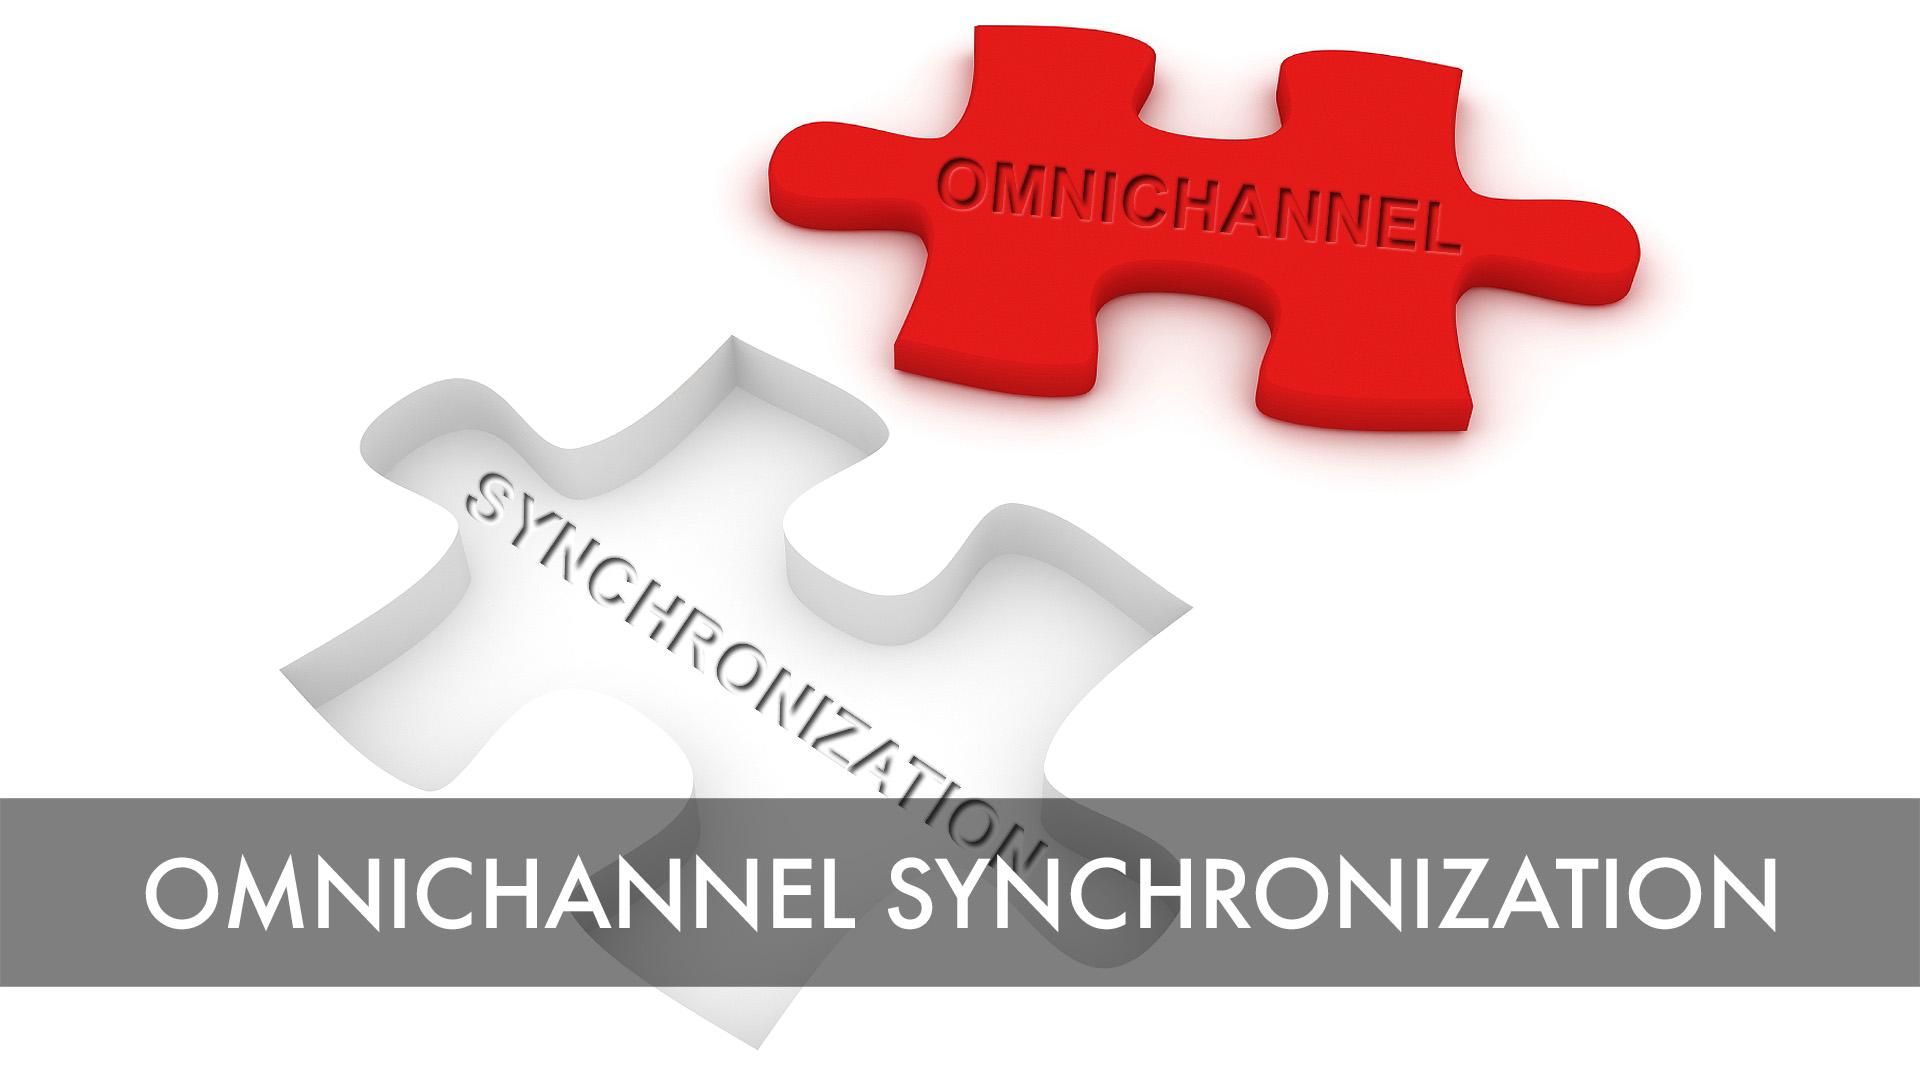 Omnichannel Synchronization Thumbnail.jpg